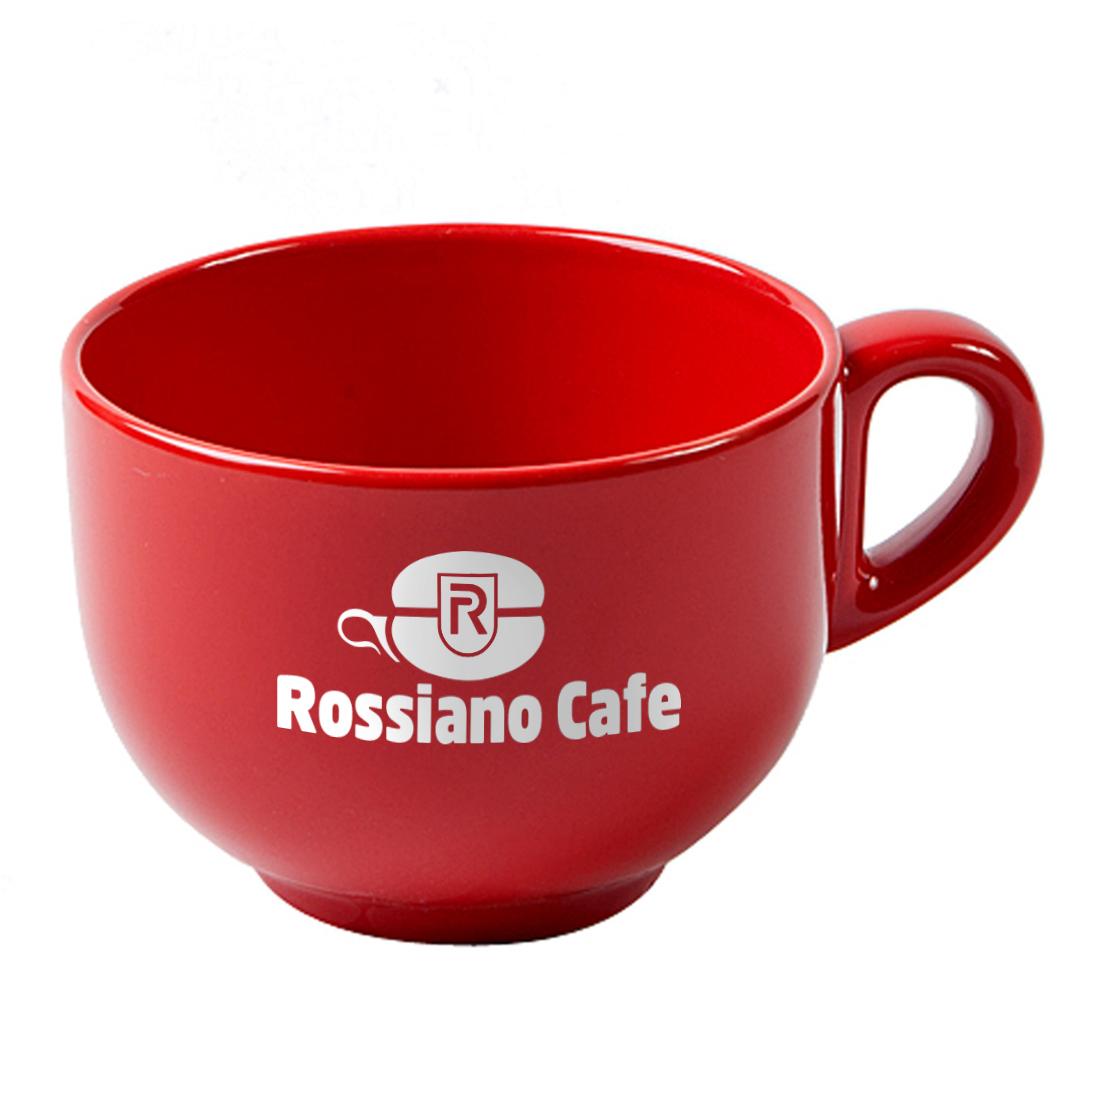 Логотип для кофейного бренда «Rossiano cafe». фото f_35957c7ceab50170.jpg